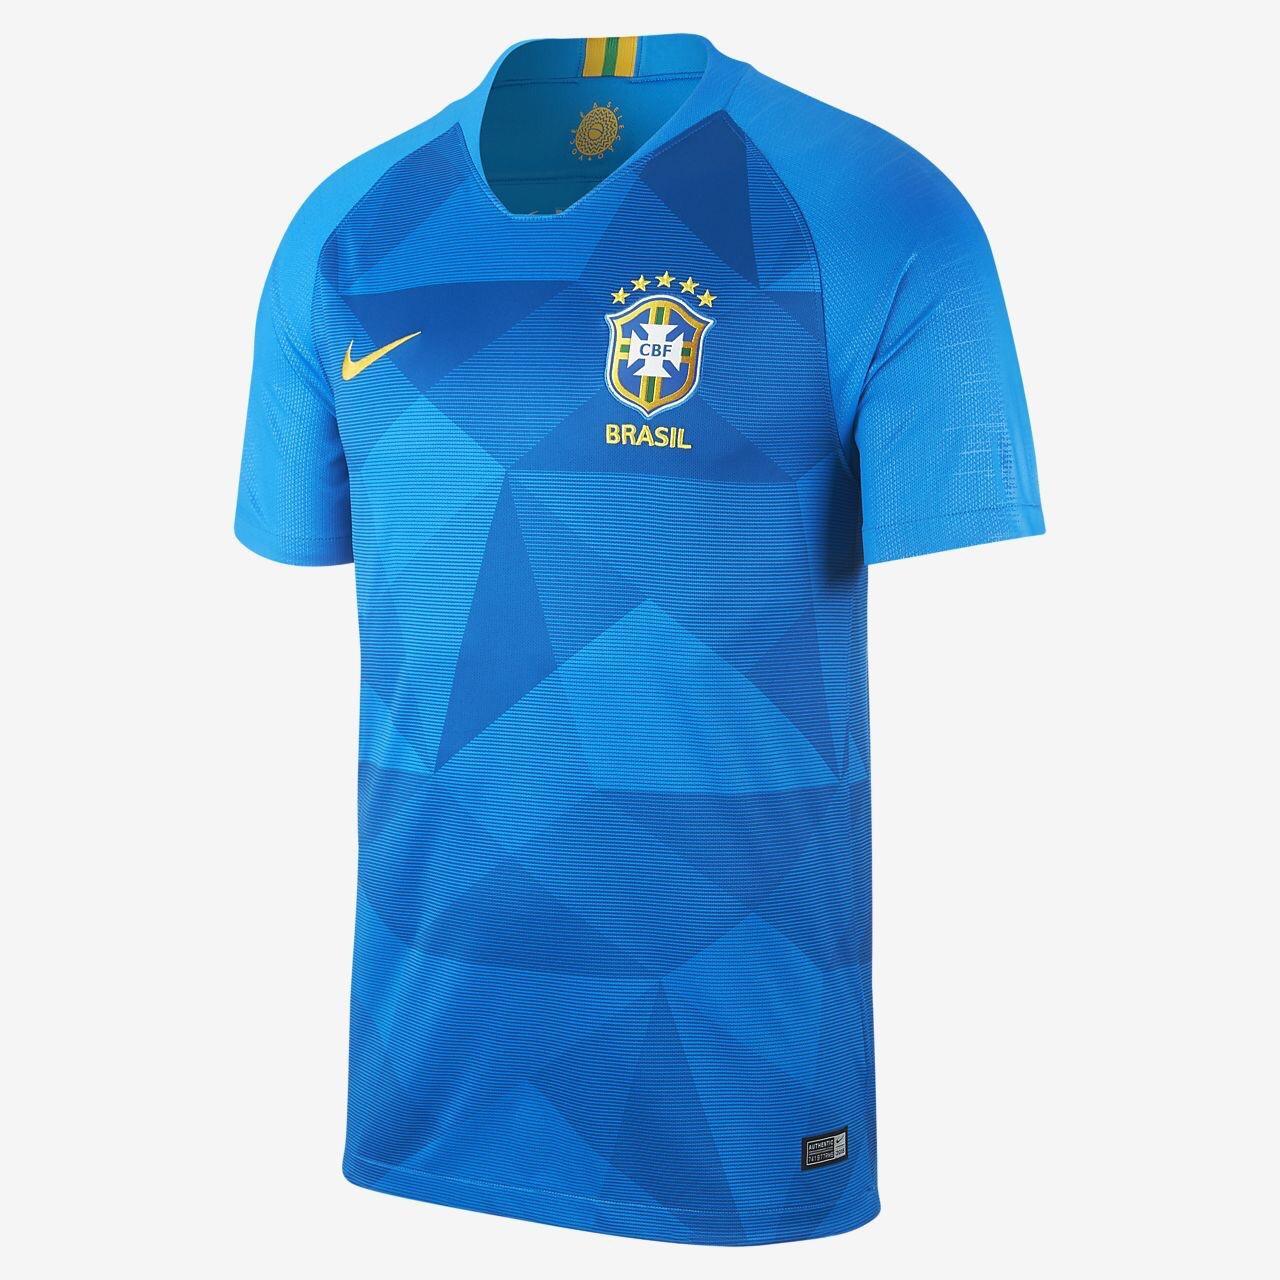 JERSEY BRAZIL AWAY WORLD CUP 2018 - JERSEY BOLA TIMNAS BRAZIL PIALA DUNIA 2018